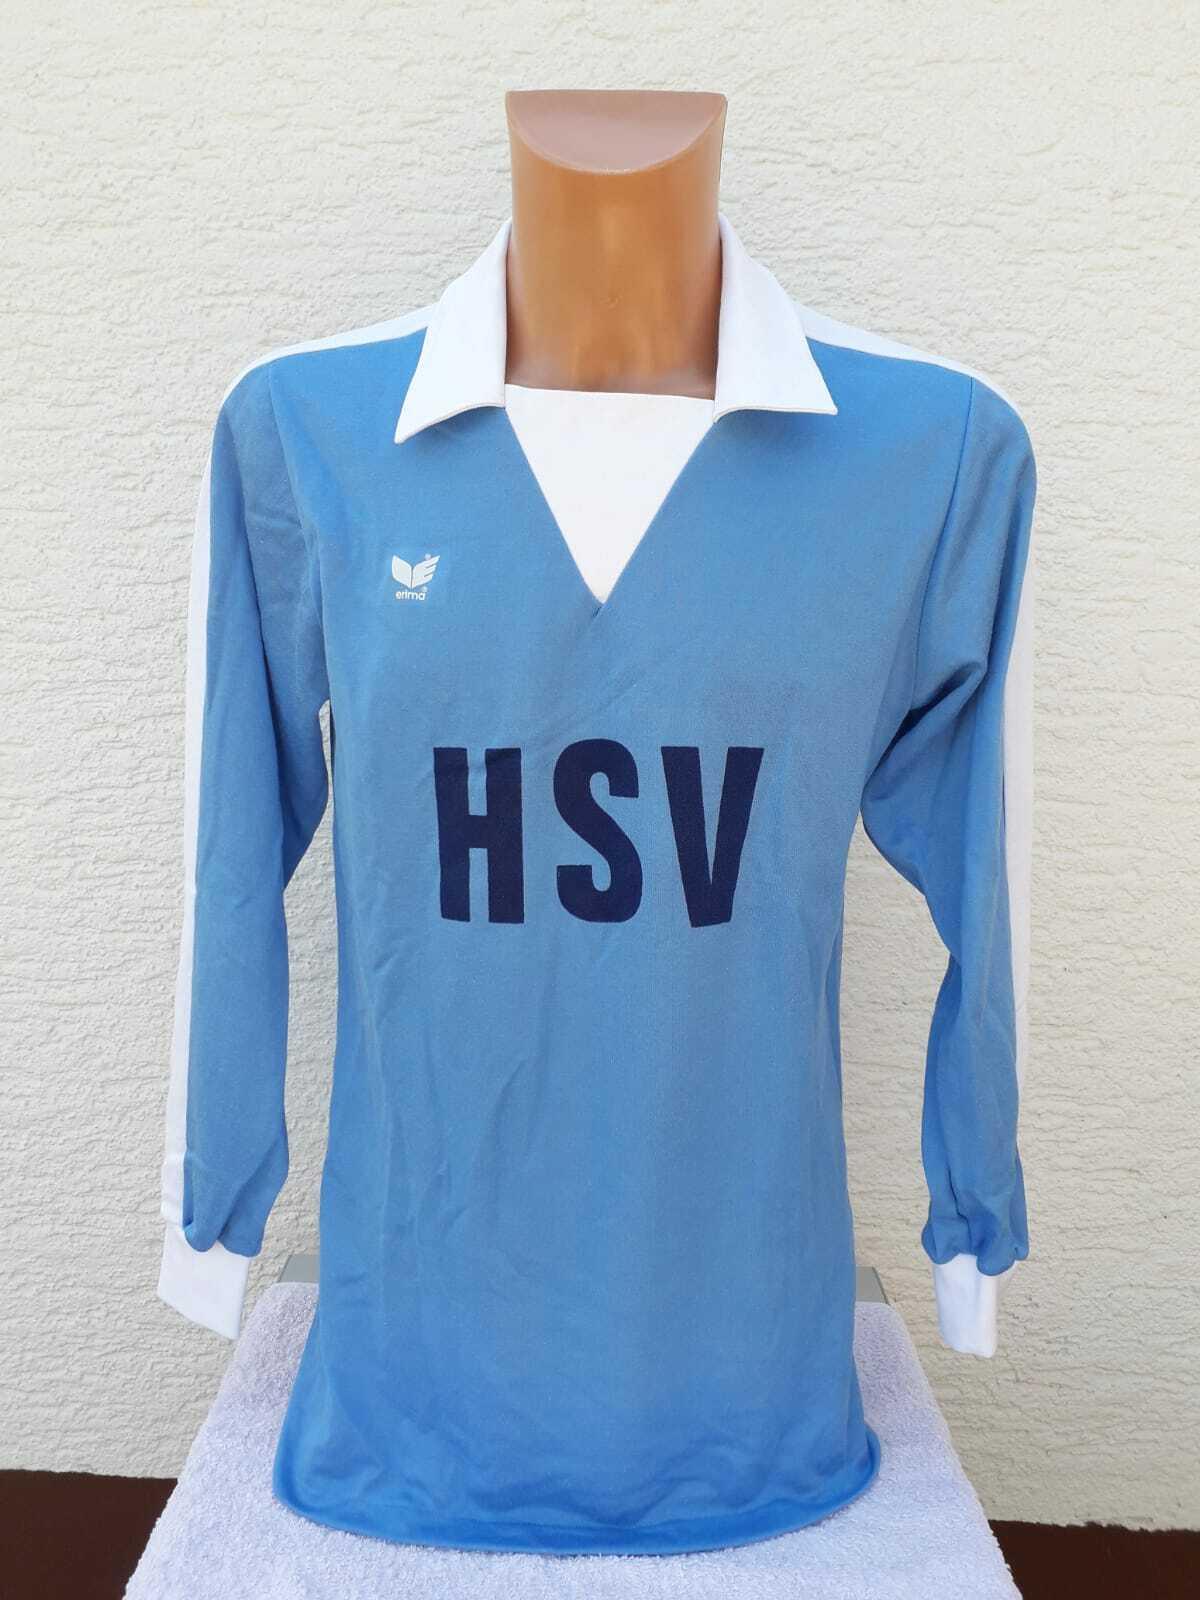 Hamburger SV Trikot M L Erima 1976-78 Shirt Jersey Maillot 70er 70s Vintage Home